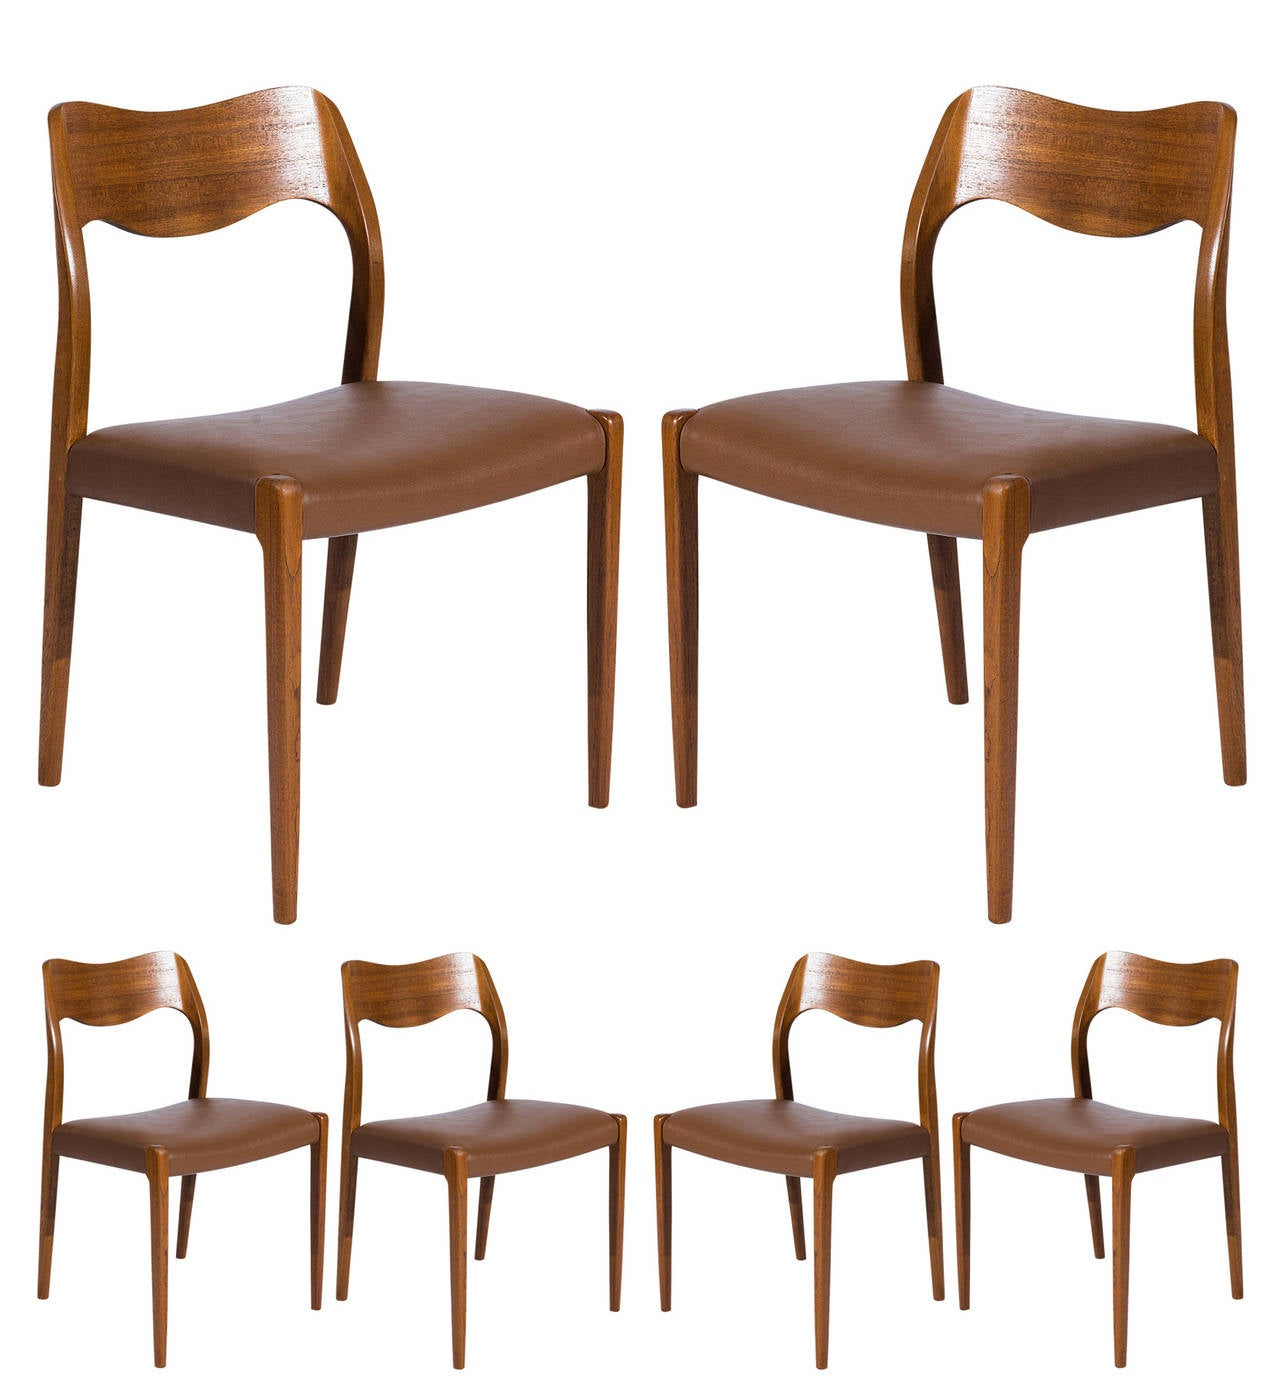 Set of Six Teak Niels Møller Model No. 71 Dining Chairs